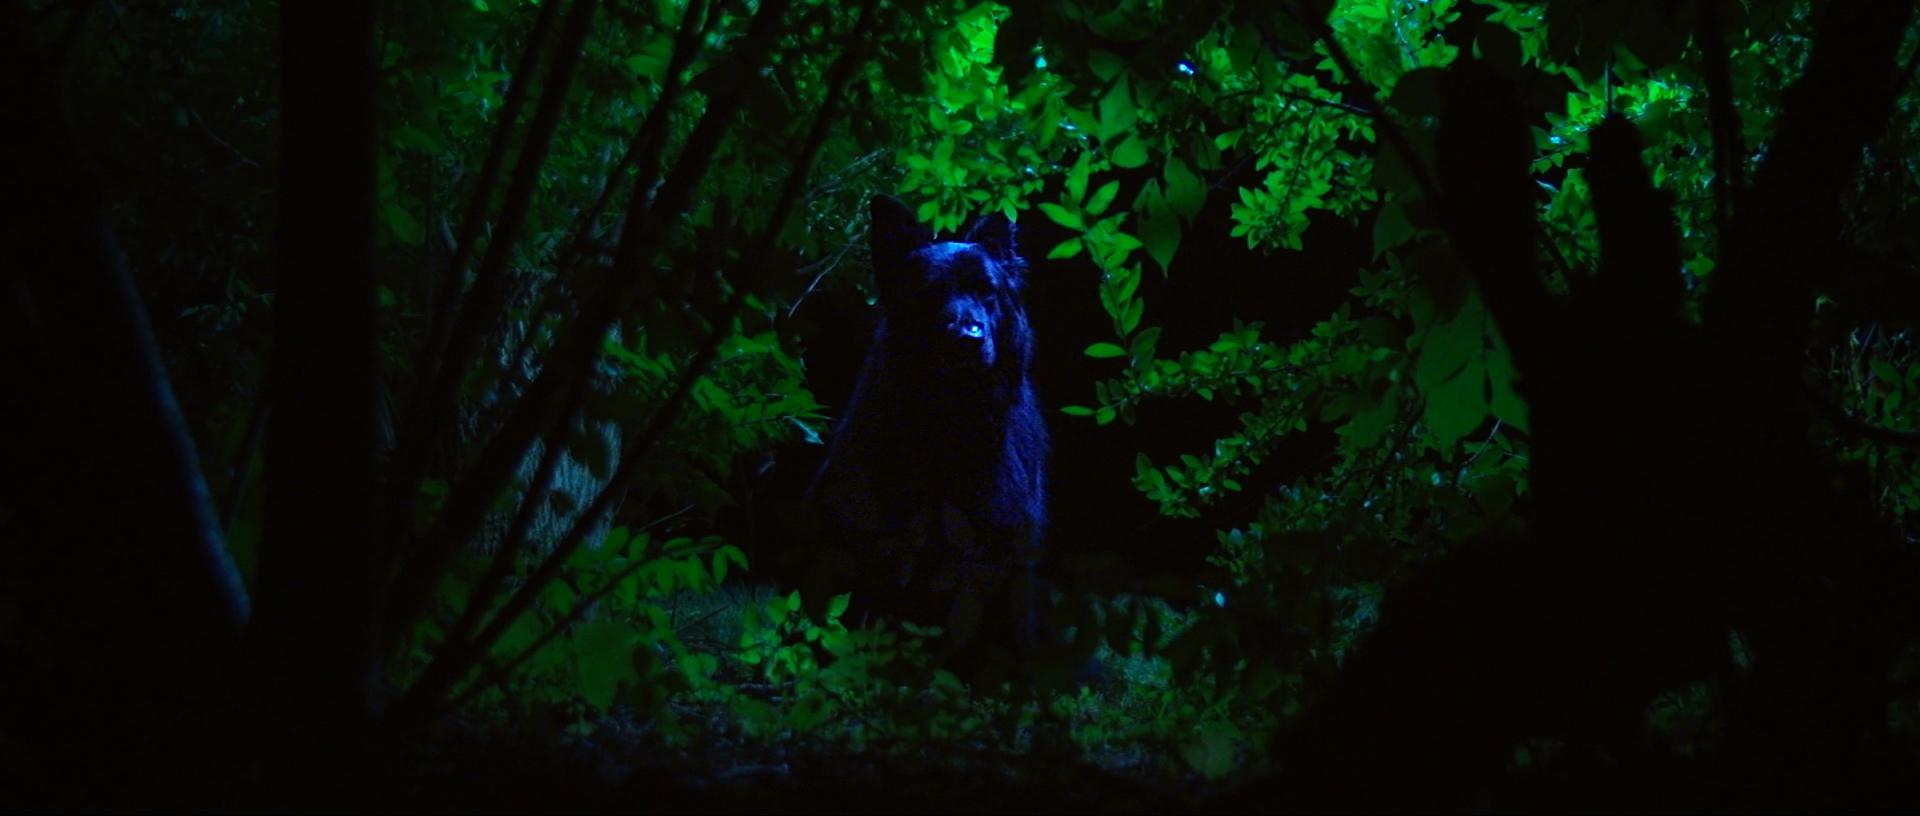 Dog in the Woods_Still 6.jpg